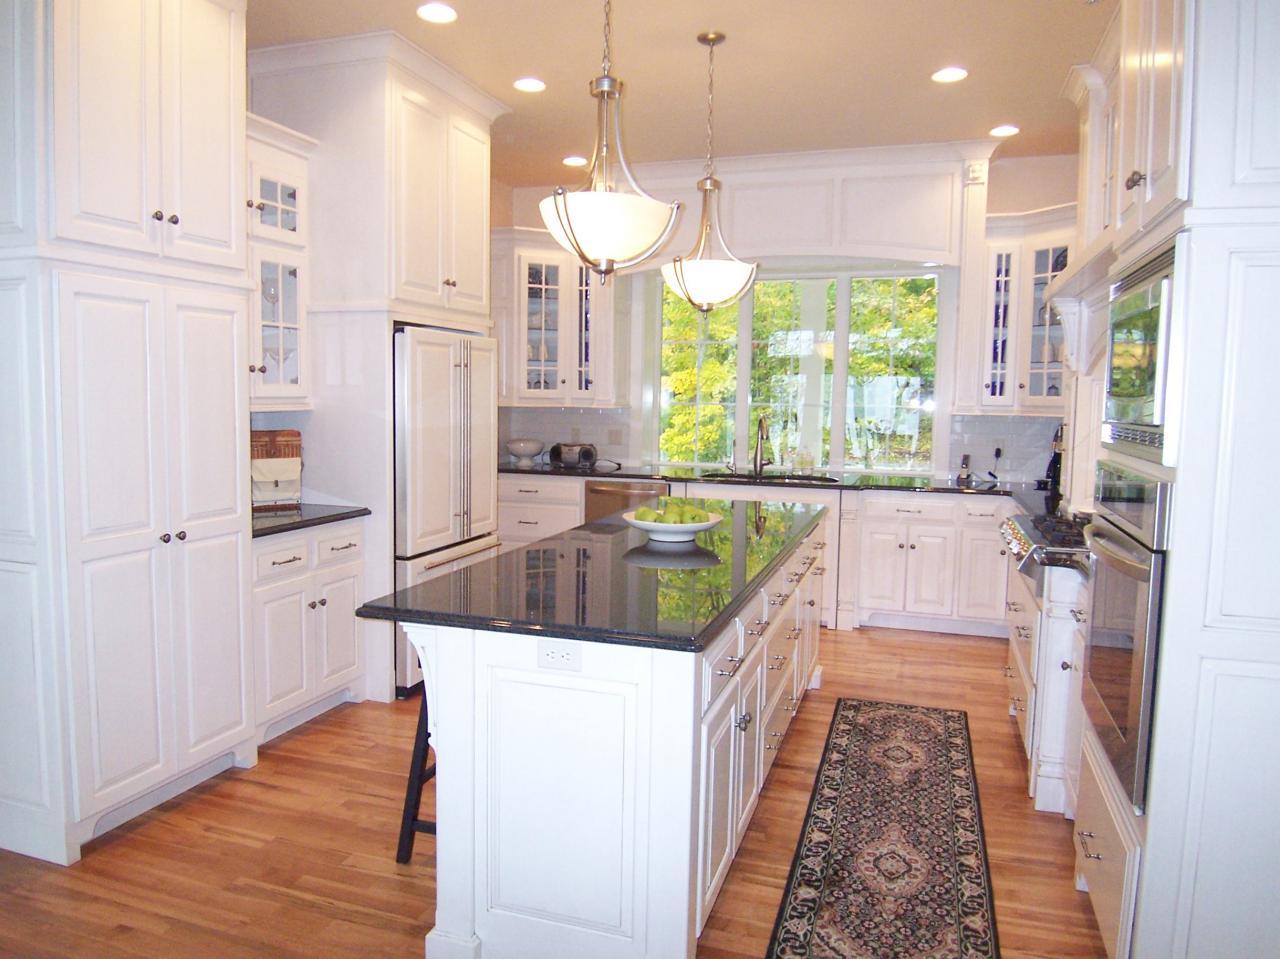 u shaped kitchen cabinets photos photo - 5